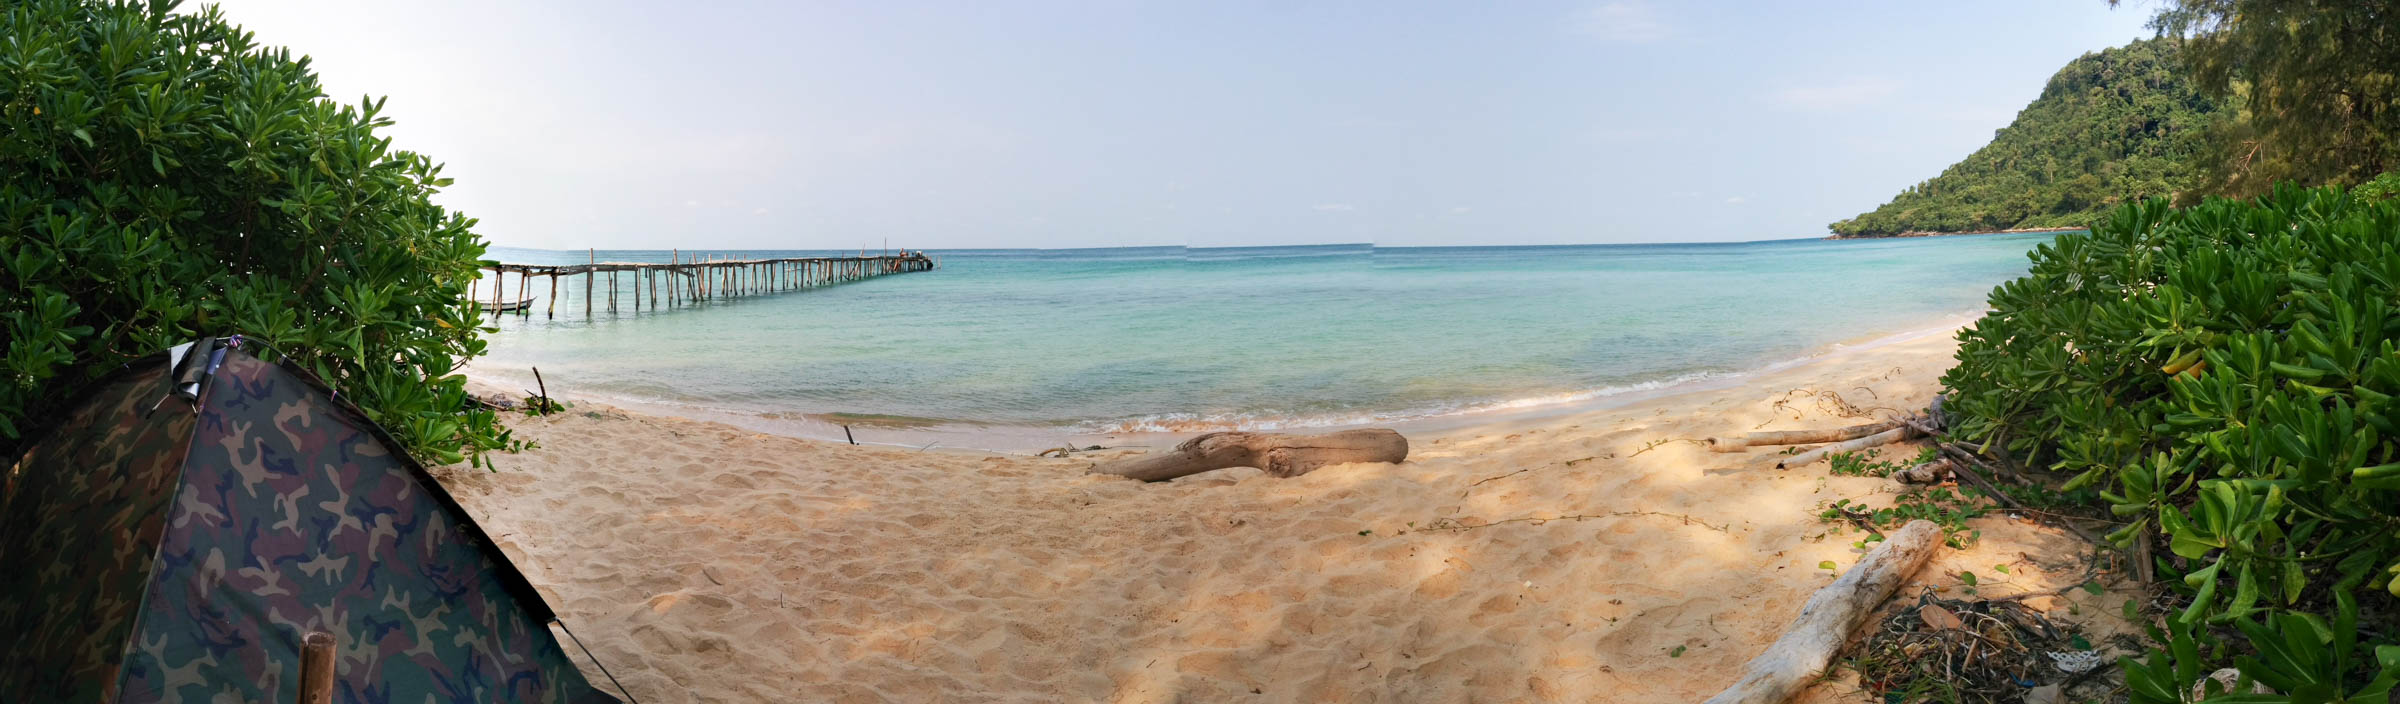 Koh Rong Samloem beach tent